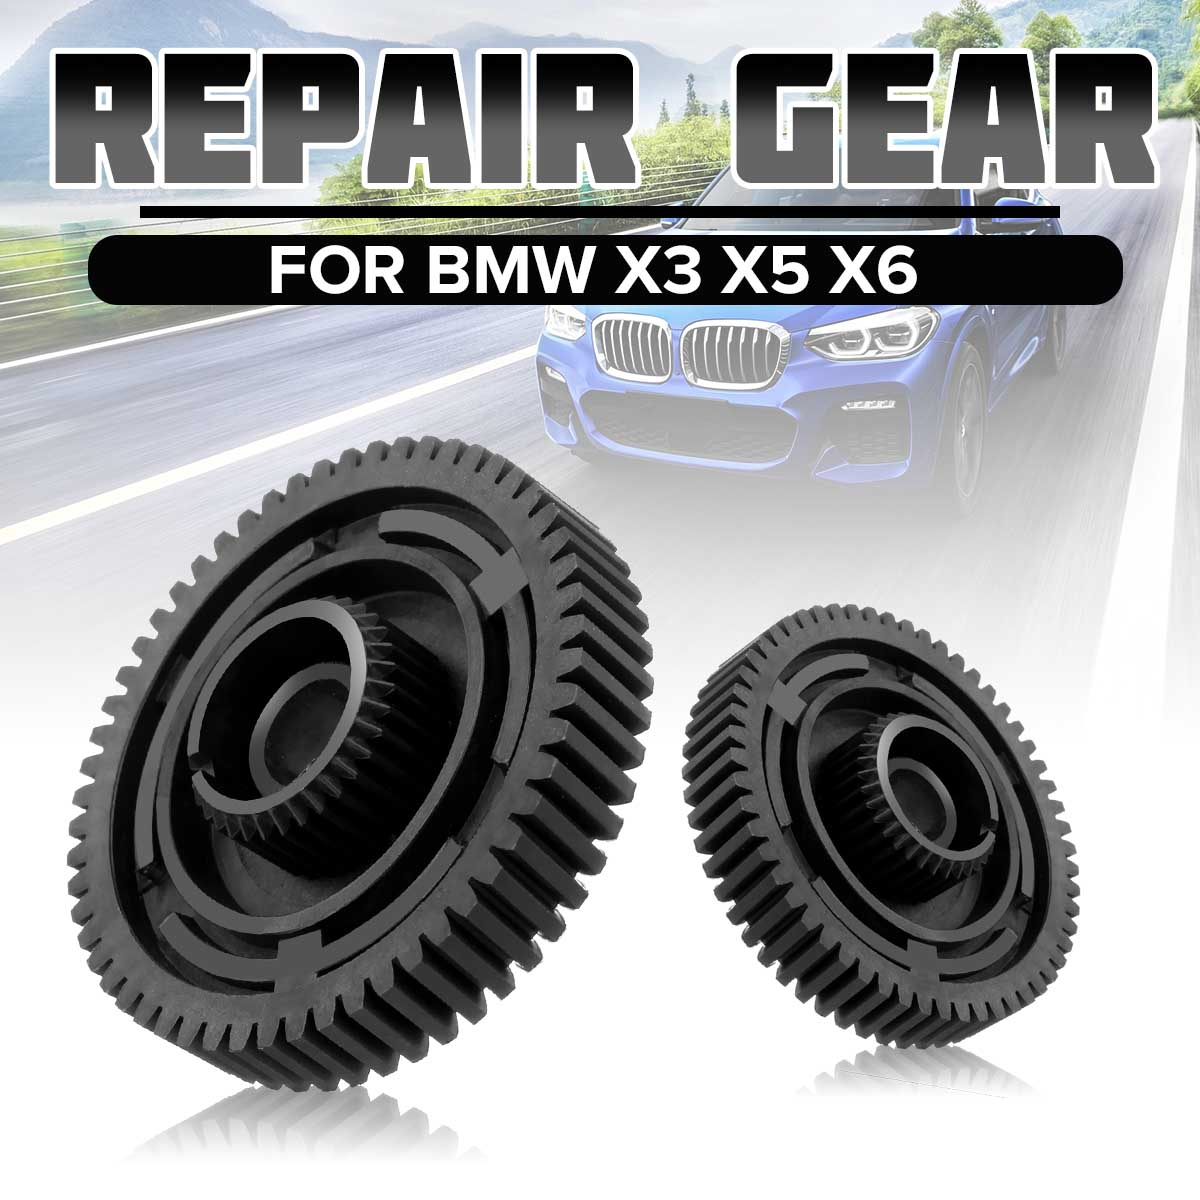 For BMW X3 X5 X6 Repair Actuator Motor Transfer Case Gear 27107566296GR Black